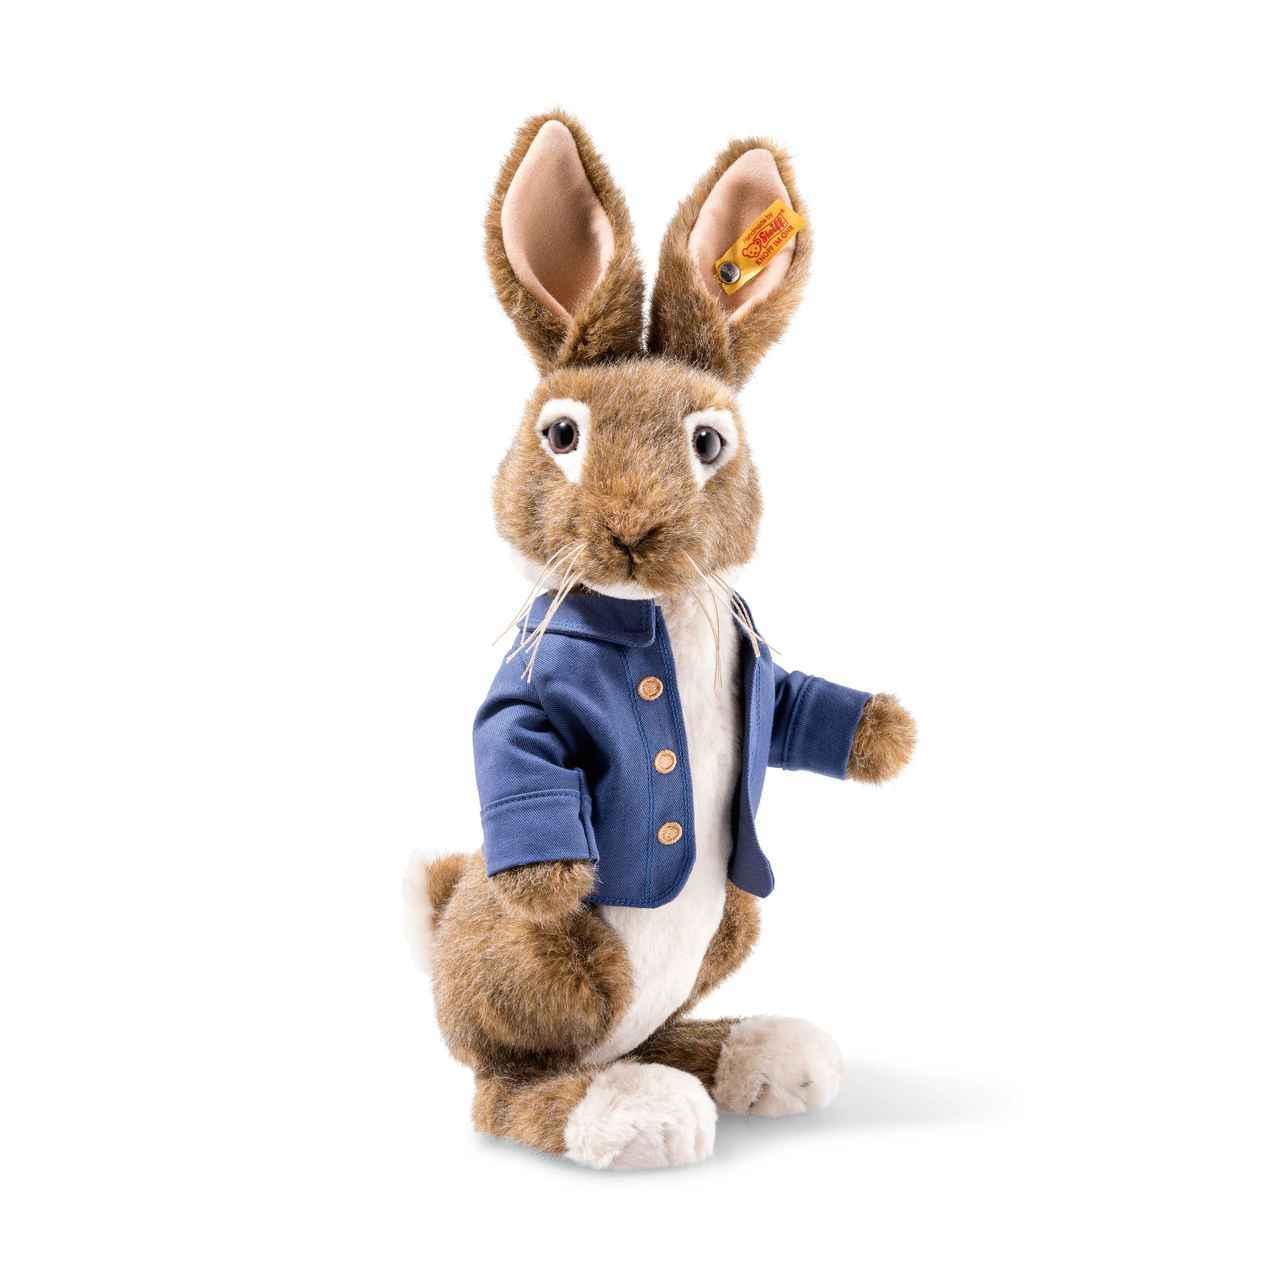 Steiff Peter Rabbit Plush Teddy Bear EAN 355240 by